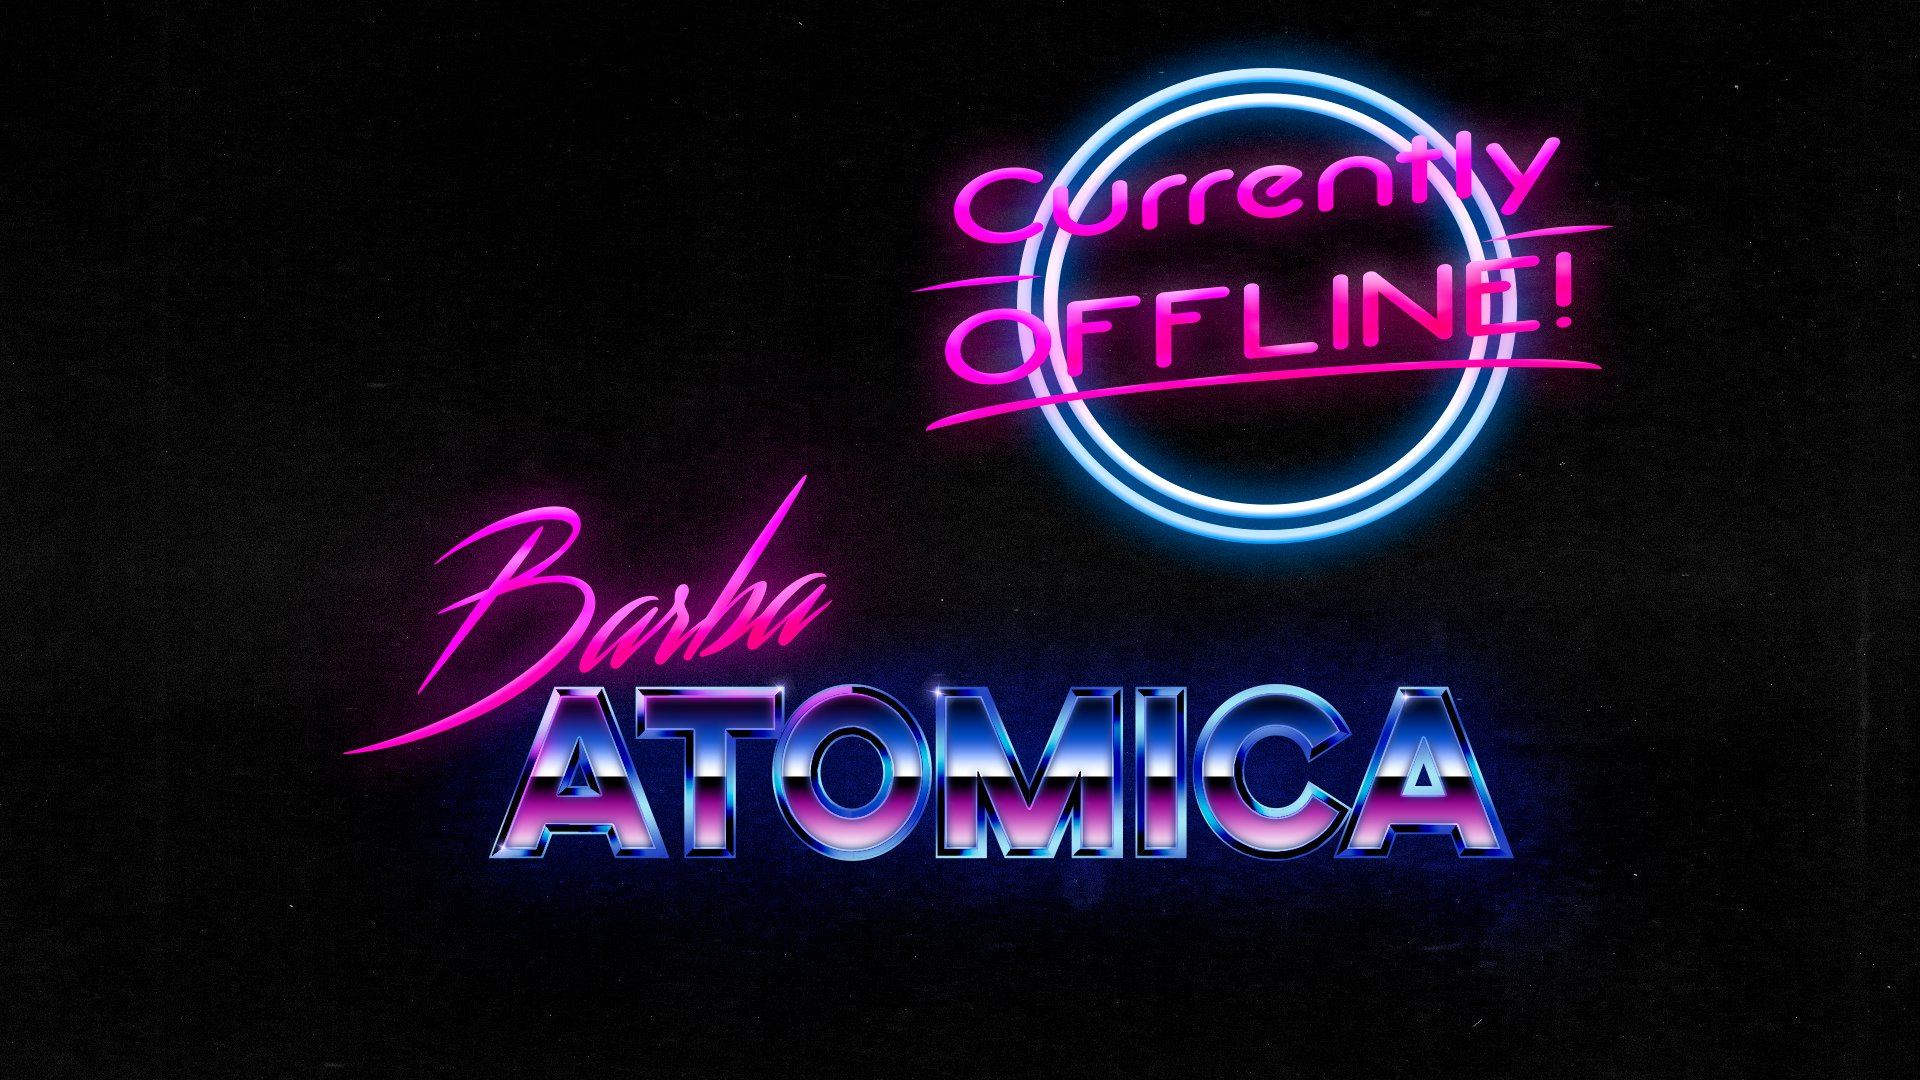 Barba_Atomica